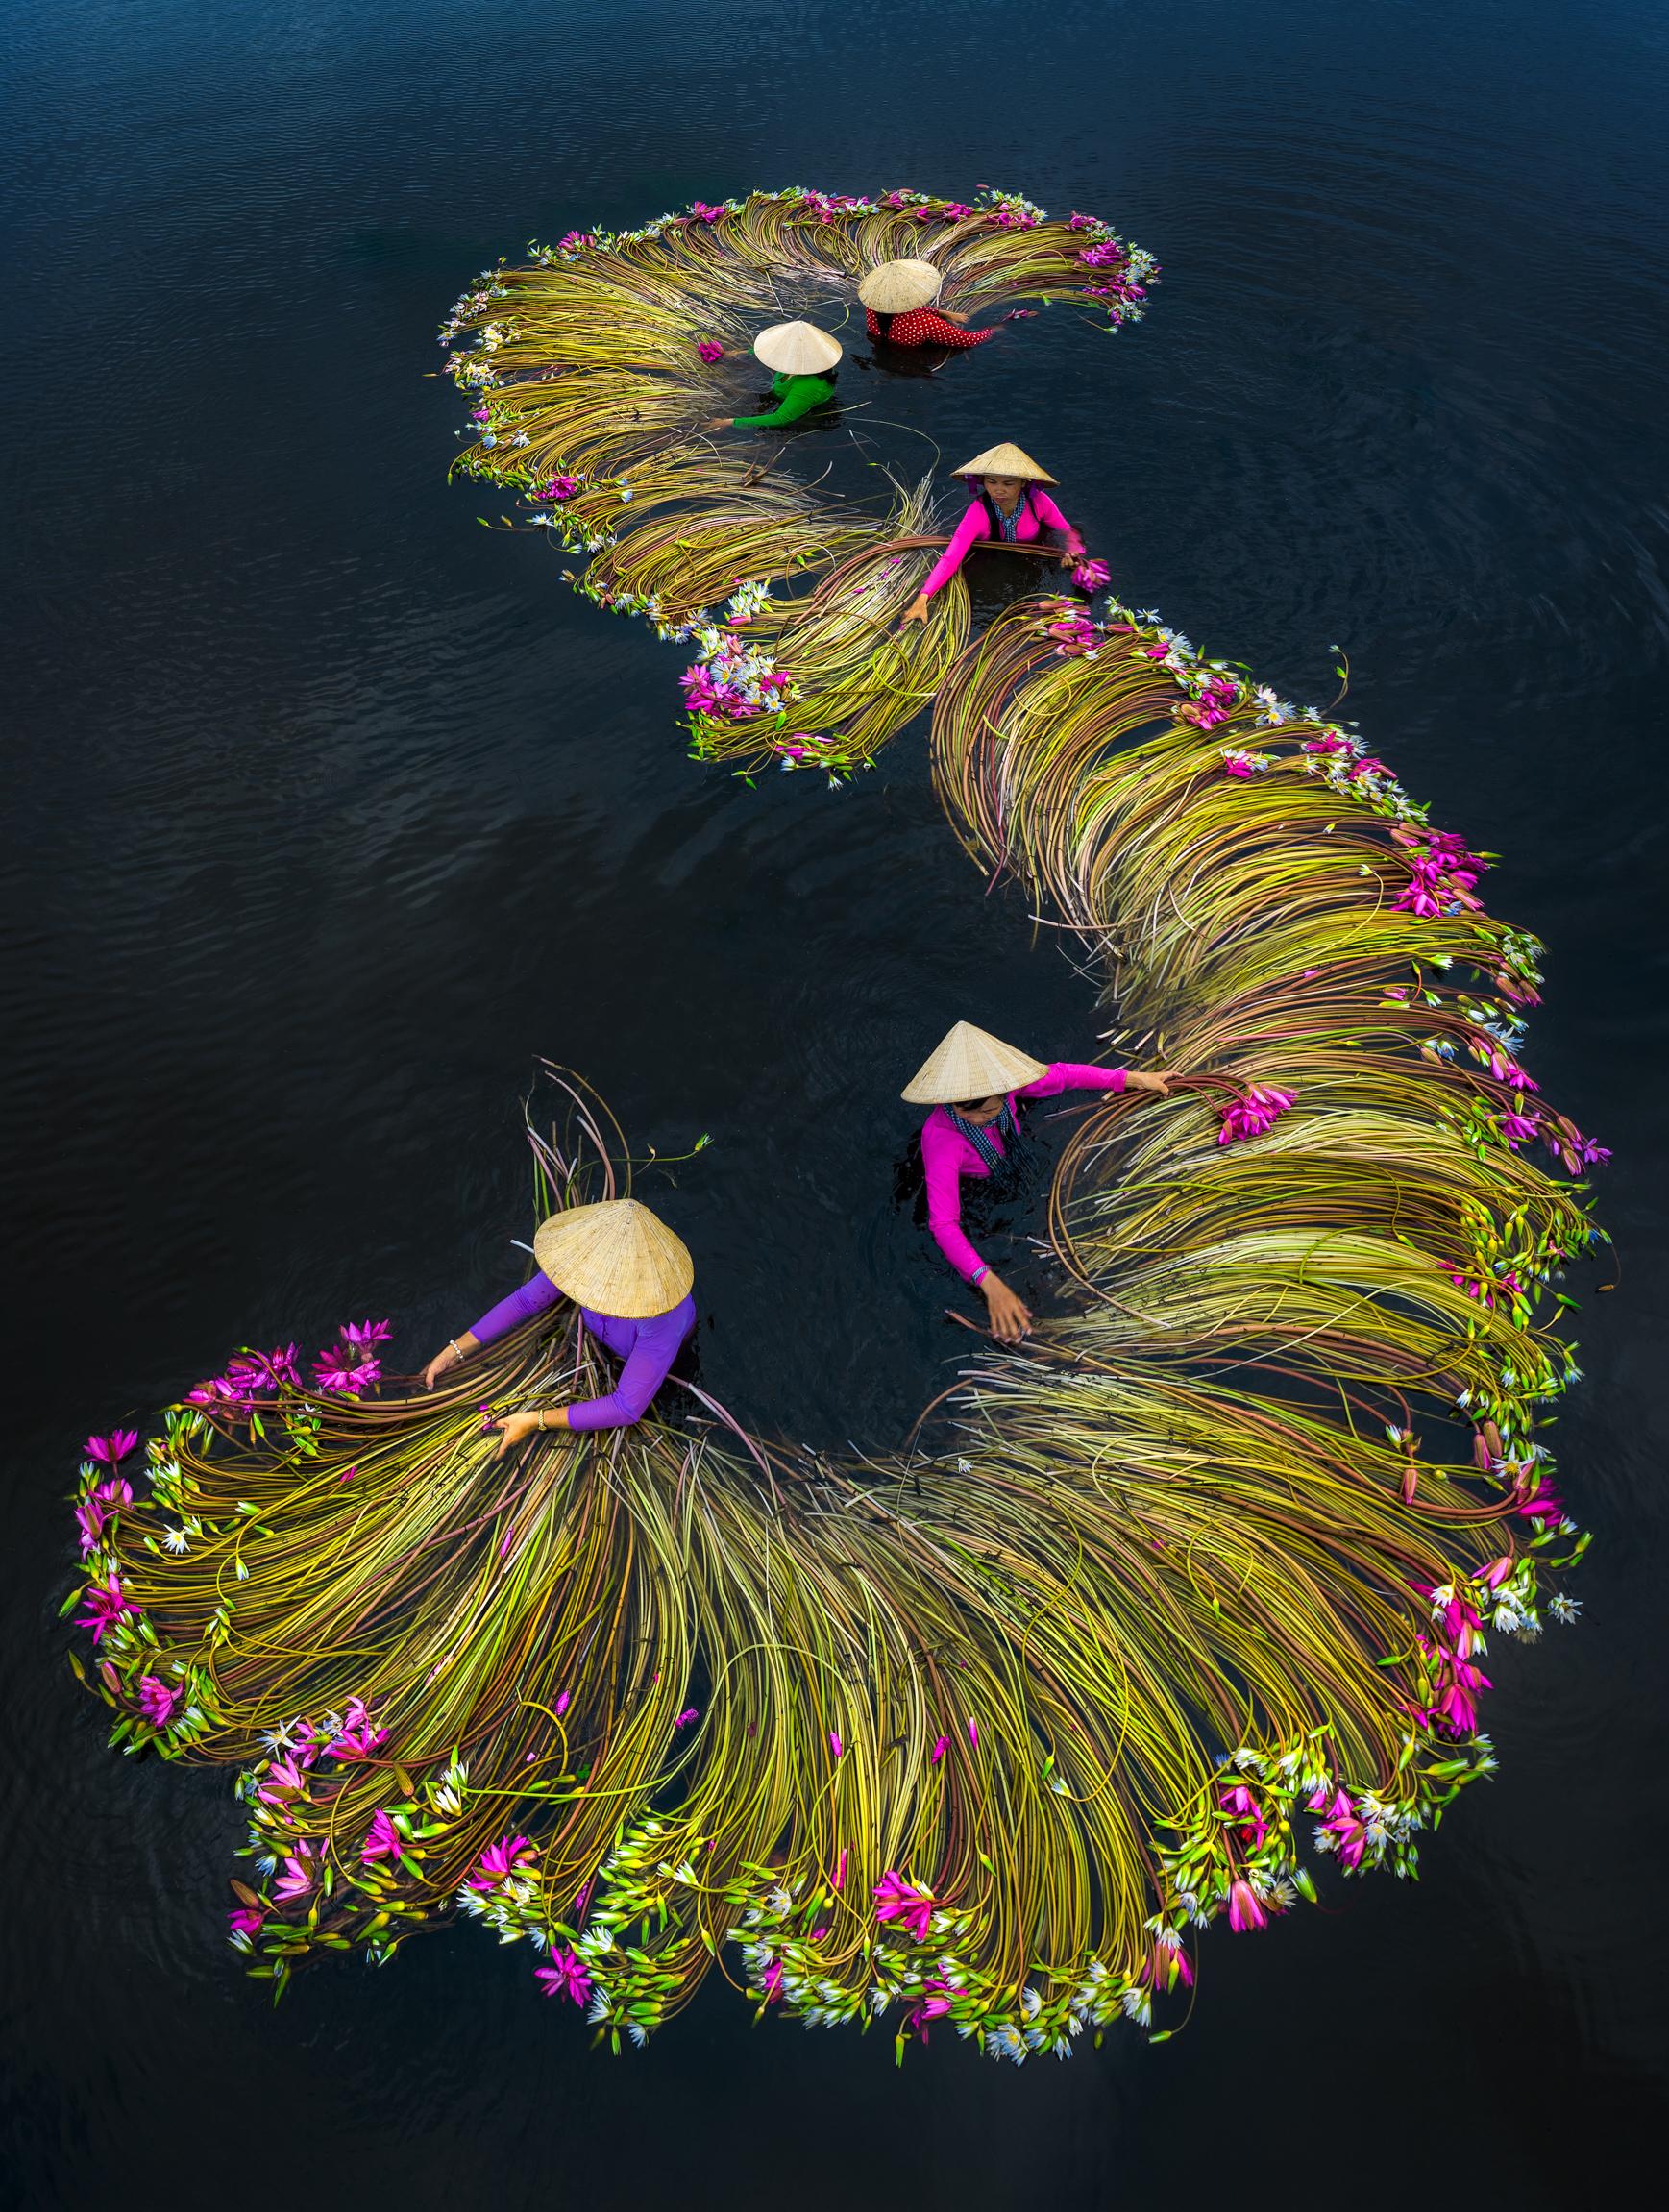 © Trung Pham Huy, Vietnam, Shortlist, Open, Travel, 2020 Sony World Photography Awards